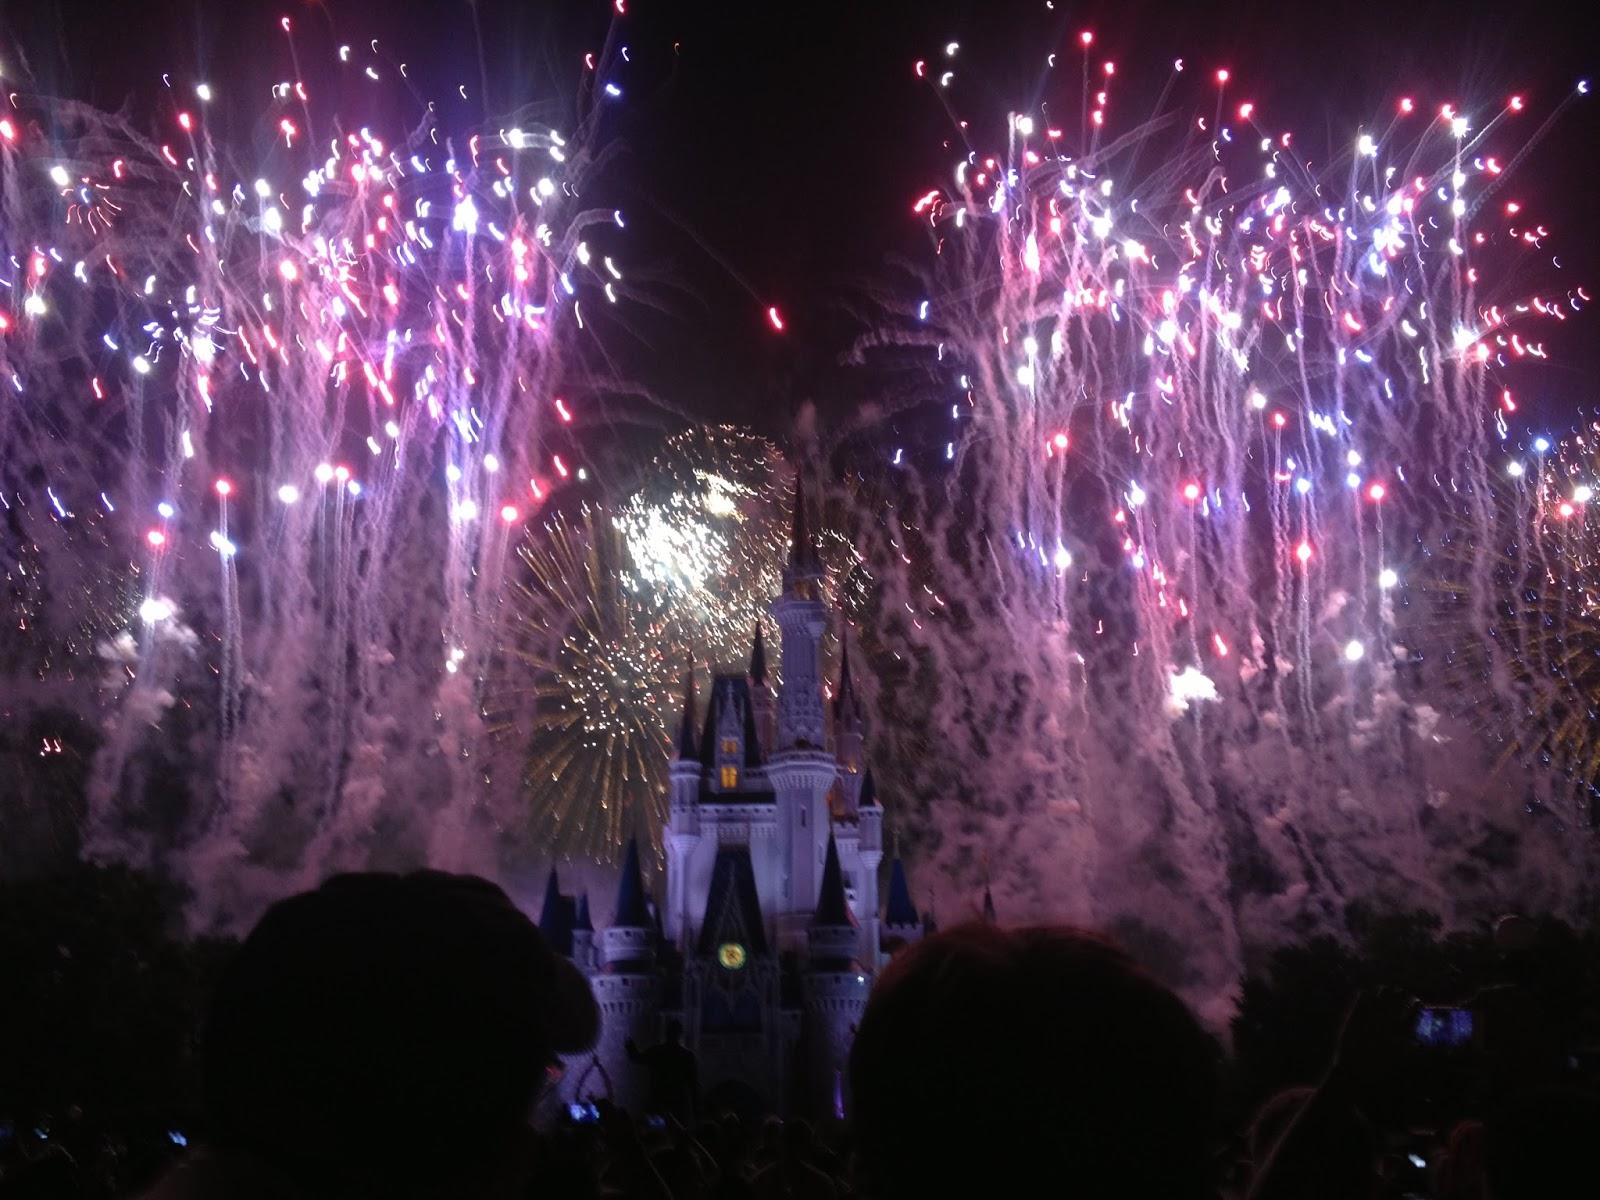 disney world castle wallpaper fireworks wwwimgkidcom